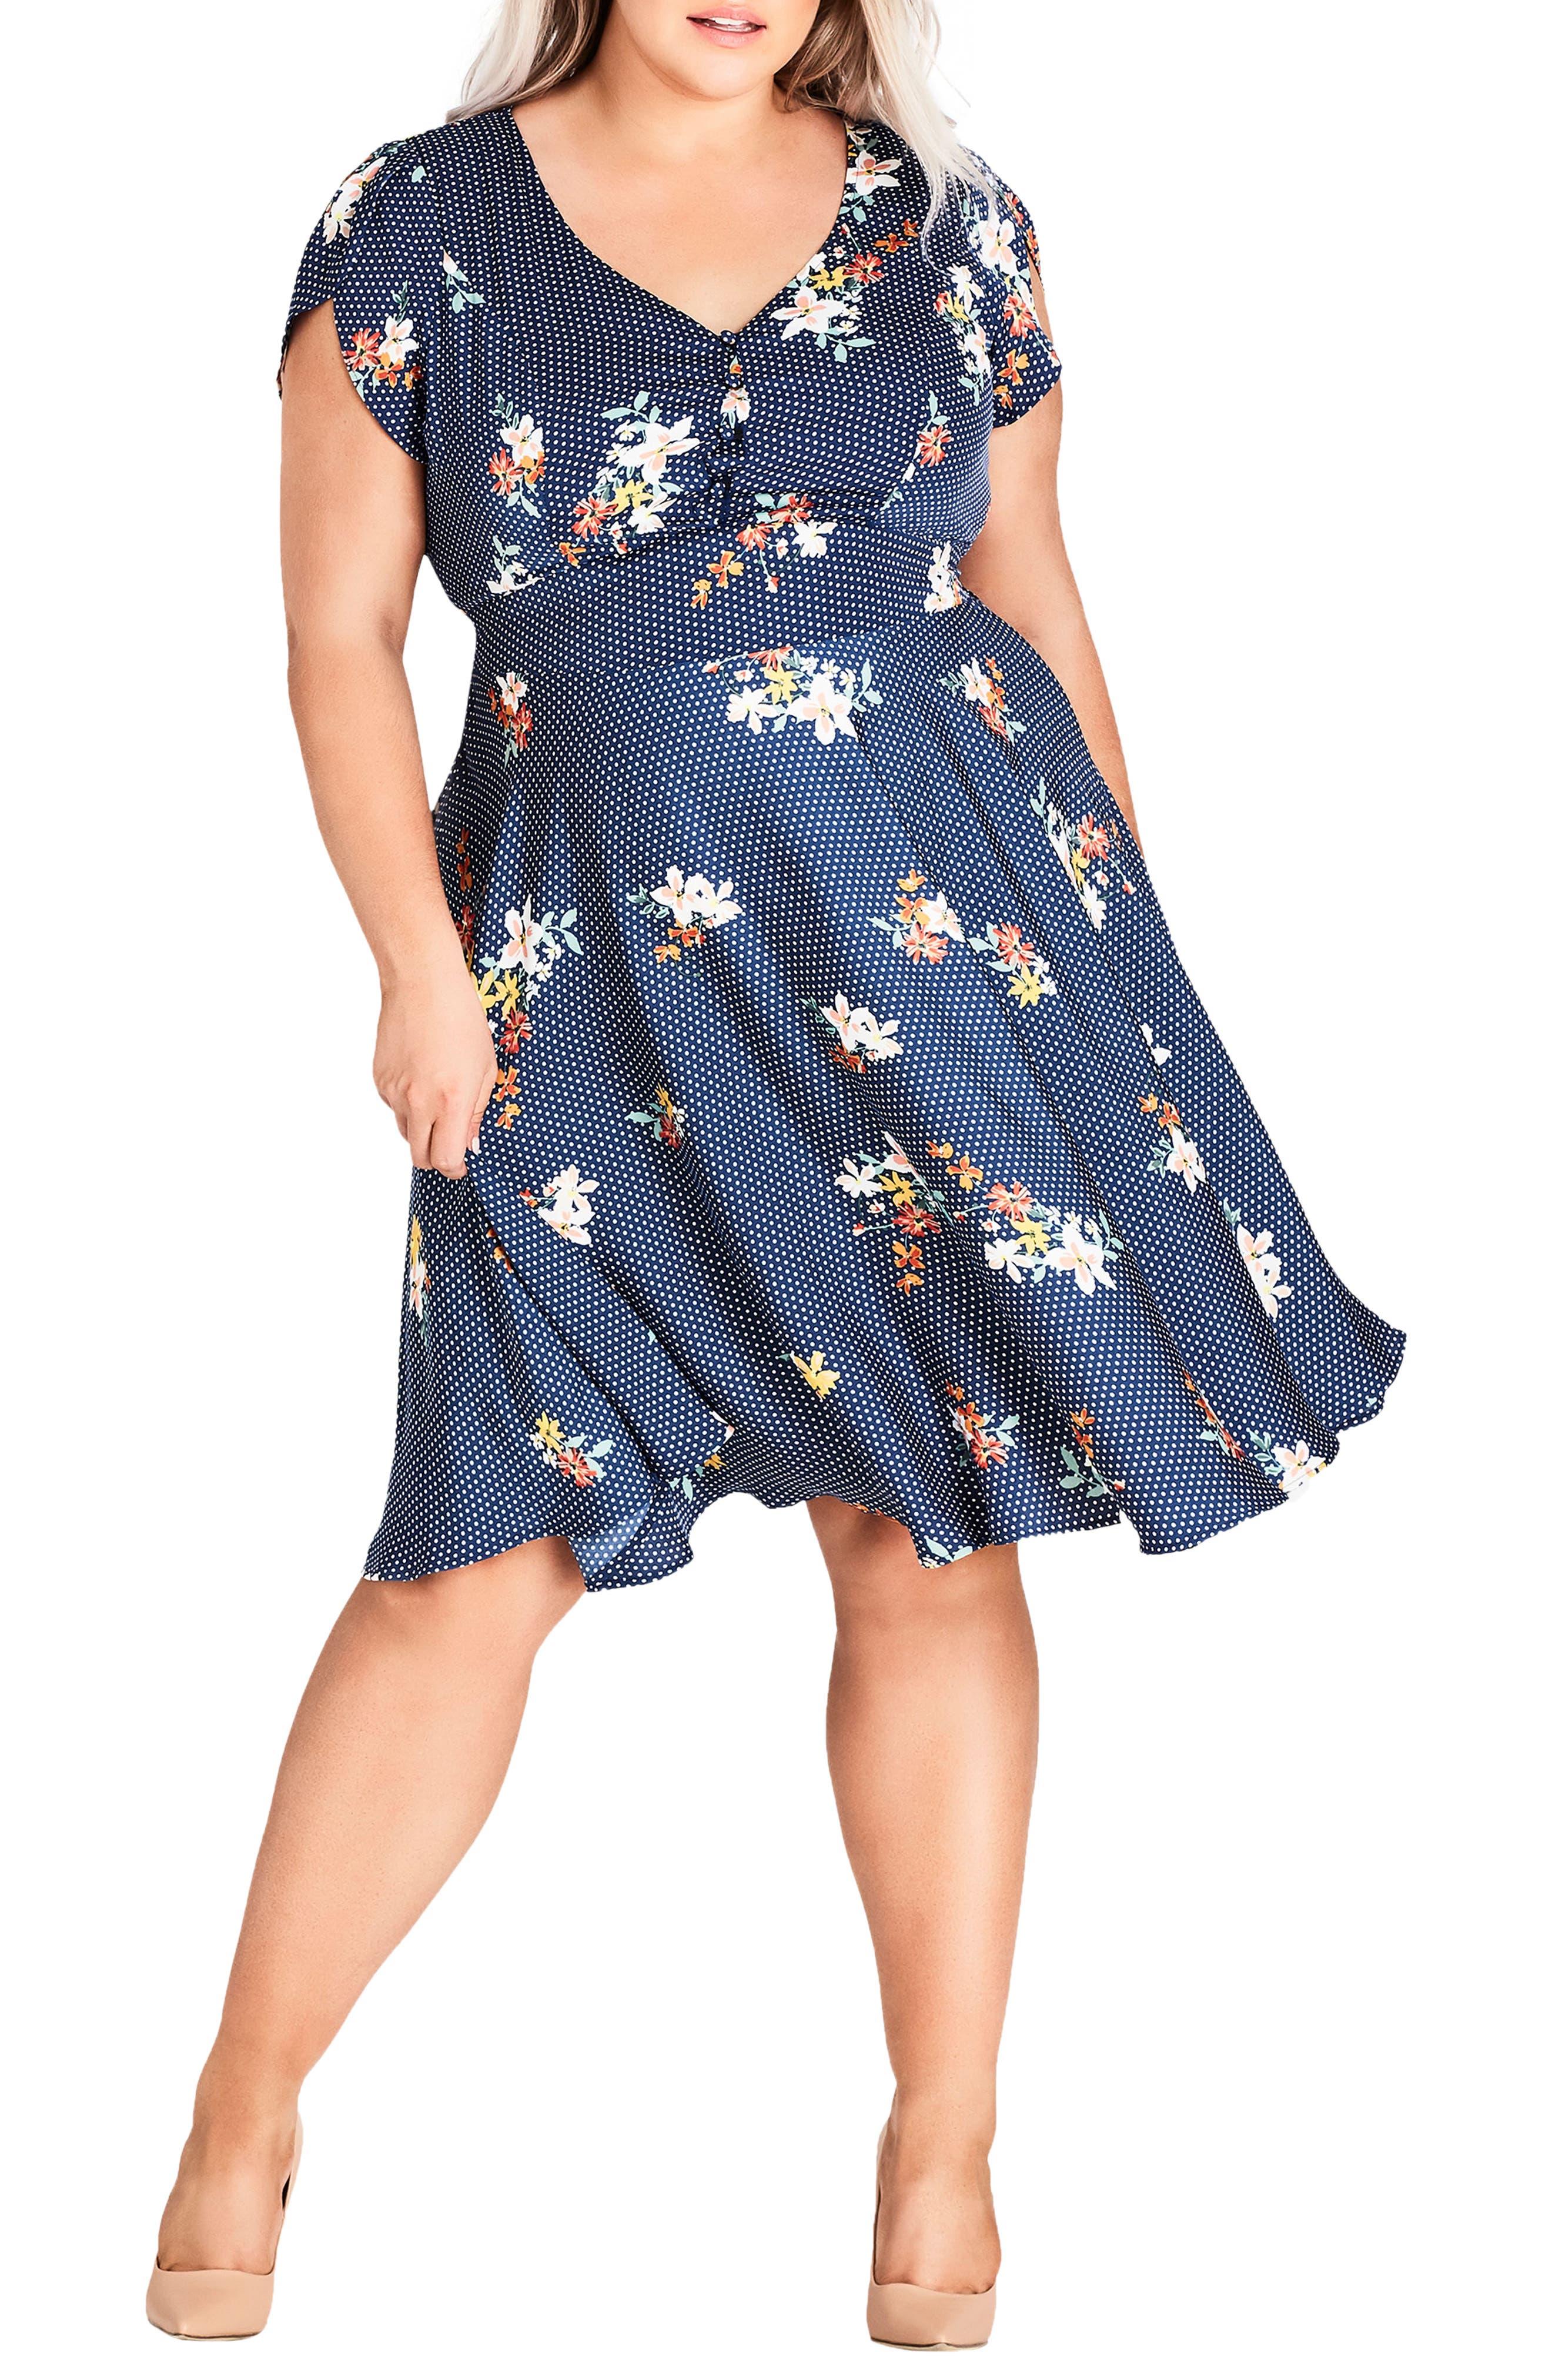 Sweet Spot Floral Fit & Flare Dress,                             Main thumbnail 1, color,                             SPOT THE FLORAL